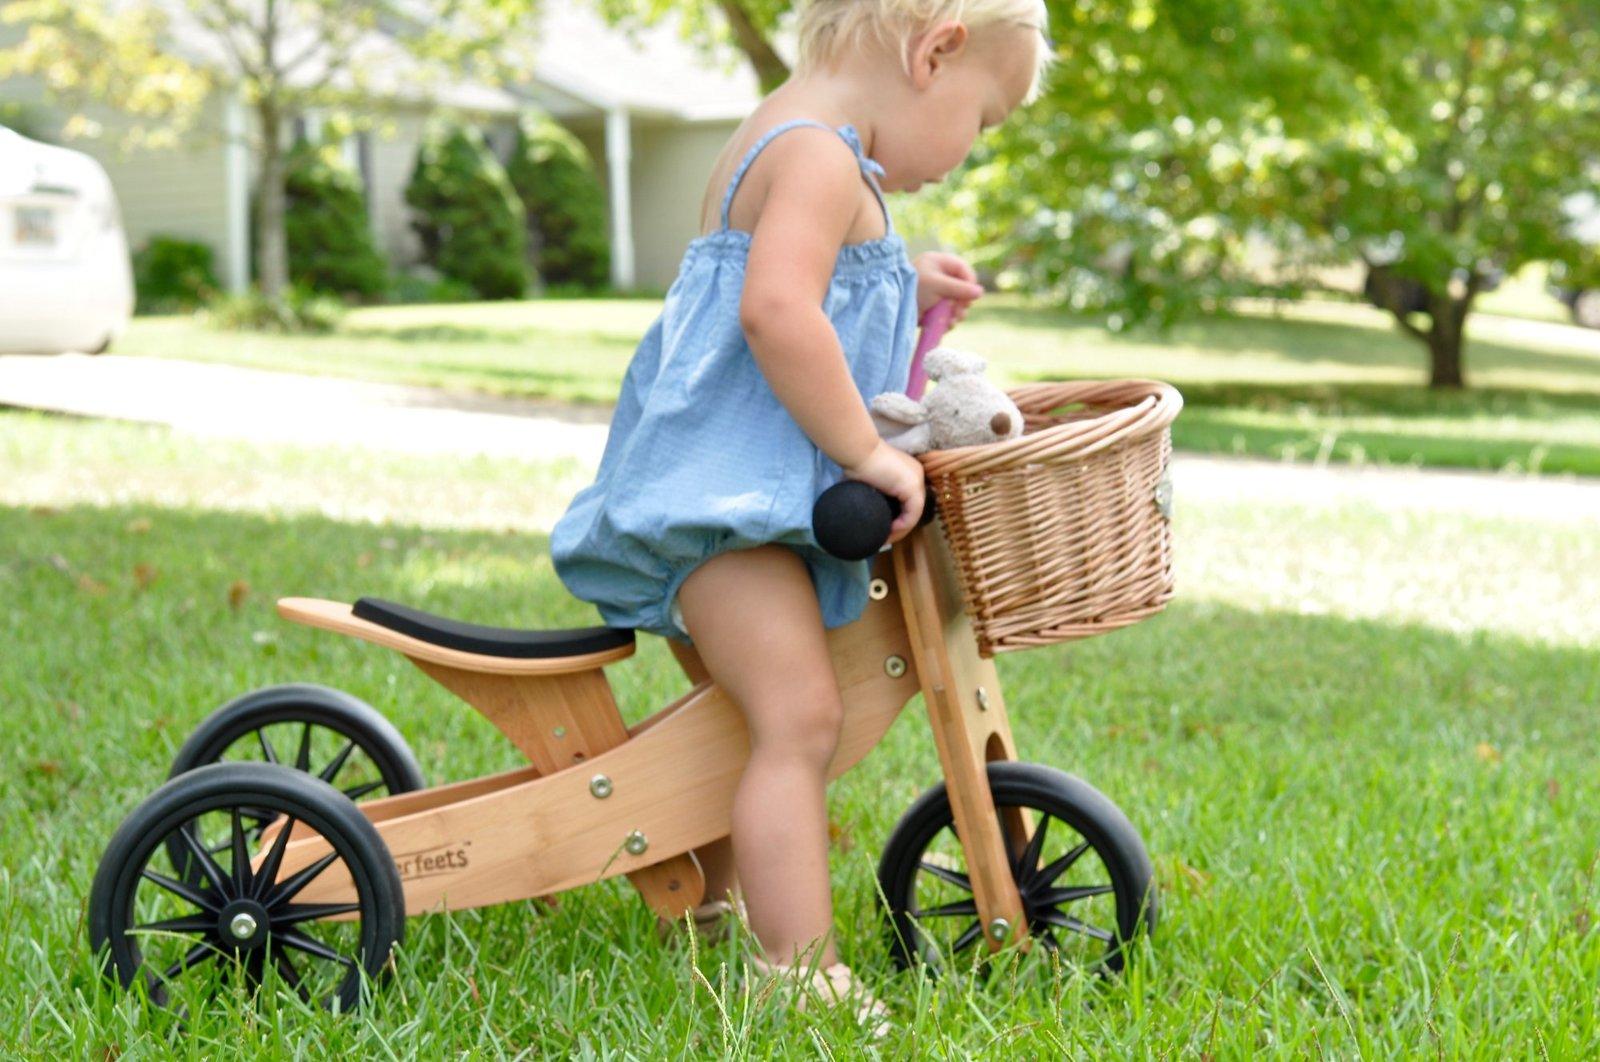 Kinderfeet: Wicker Basket - Balance Bike Accessory image